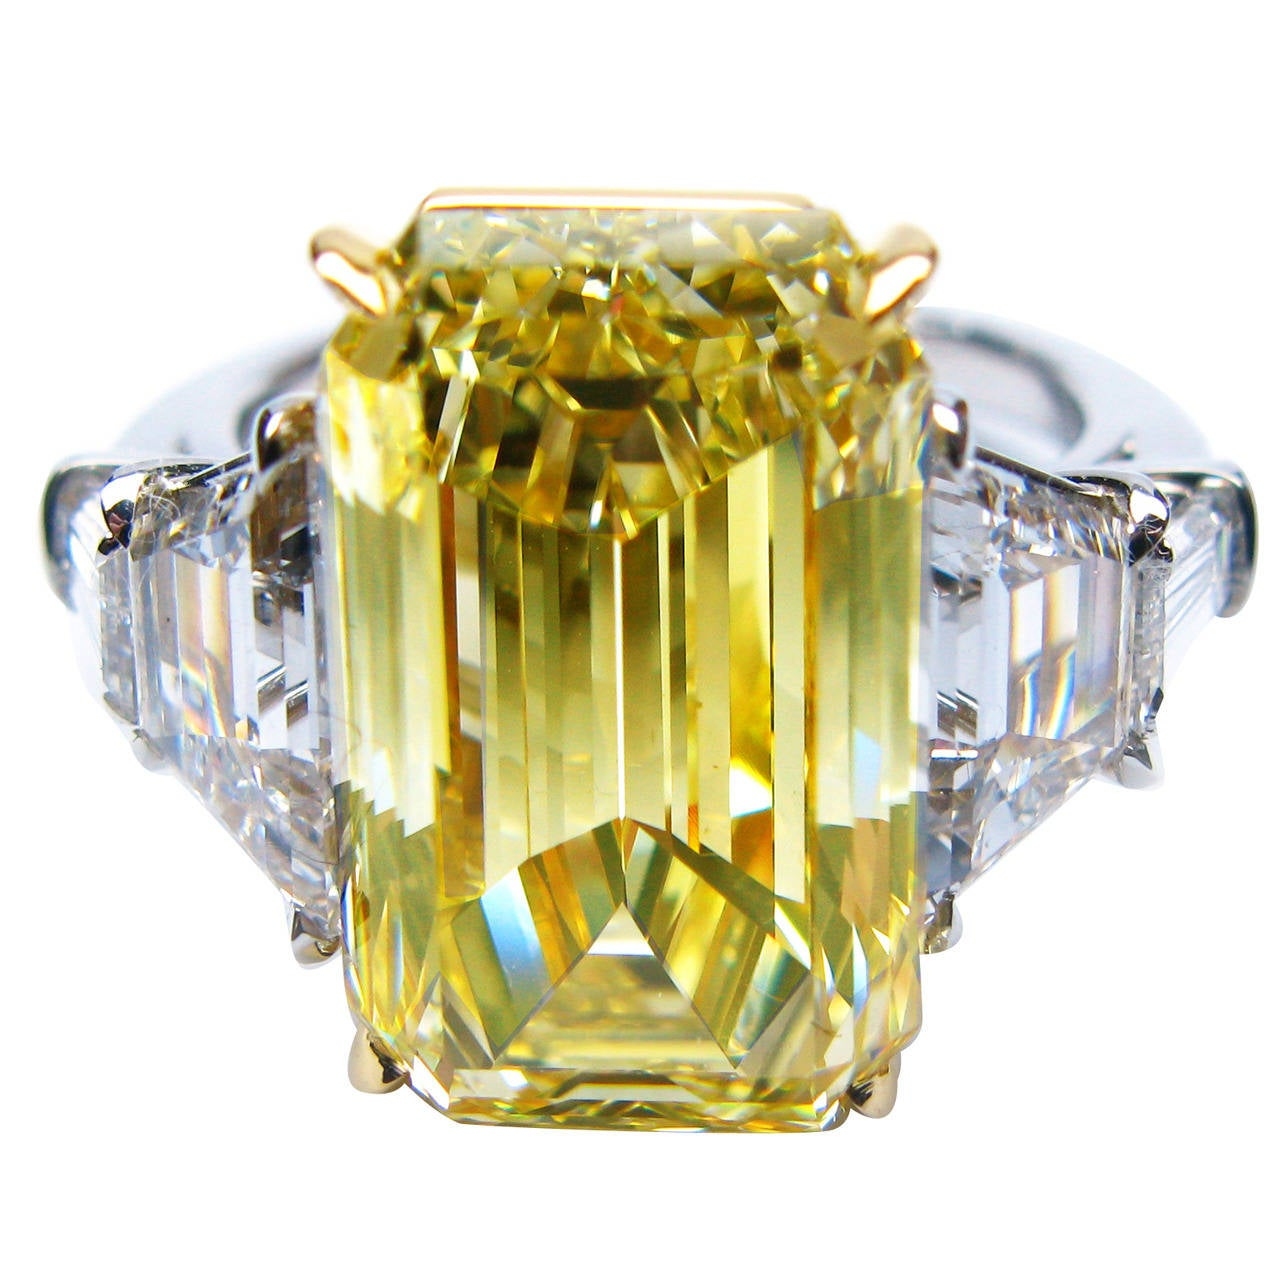 8 25 Carat Fancy Yellow Emerald Cut Diamond Gold Platinum